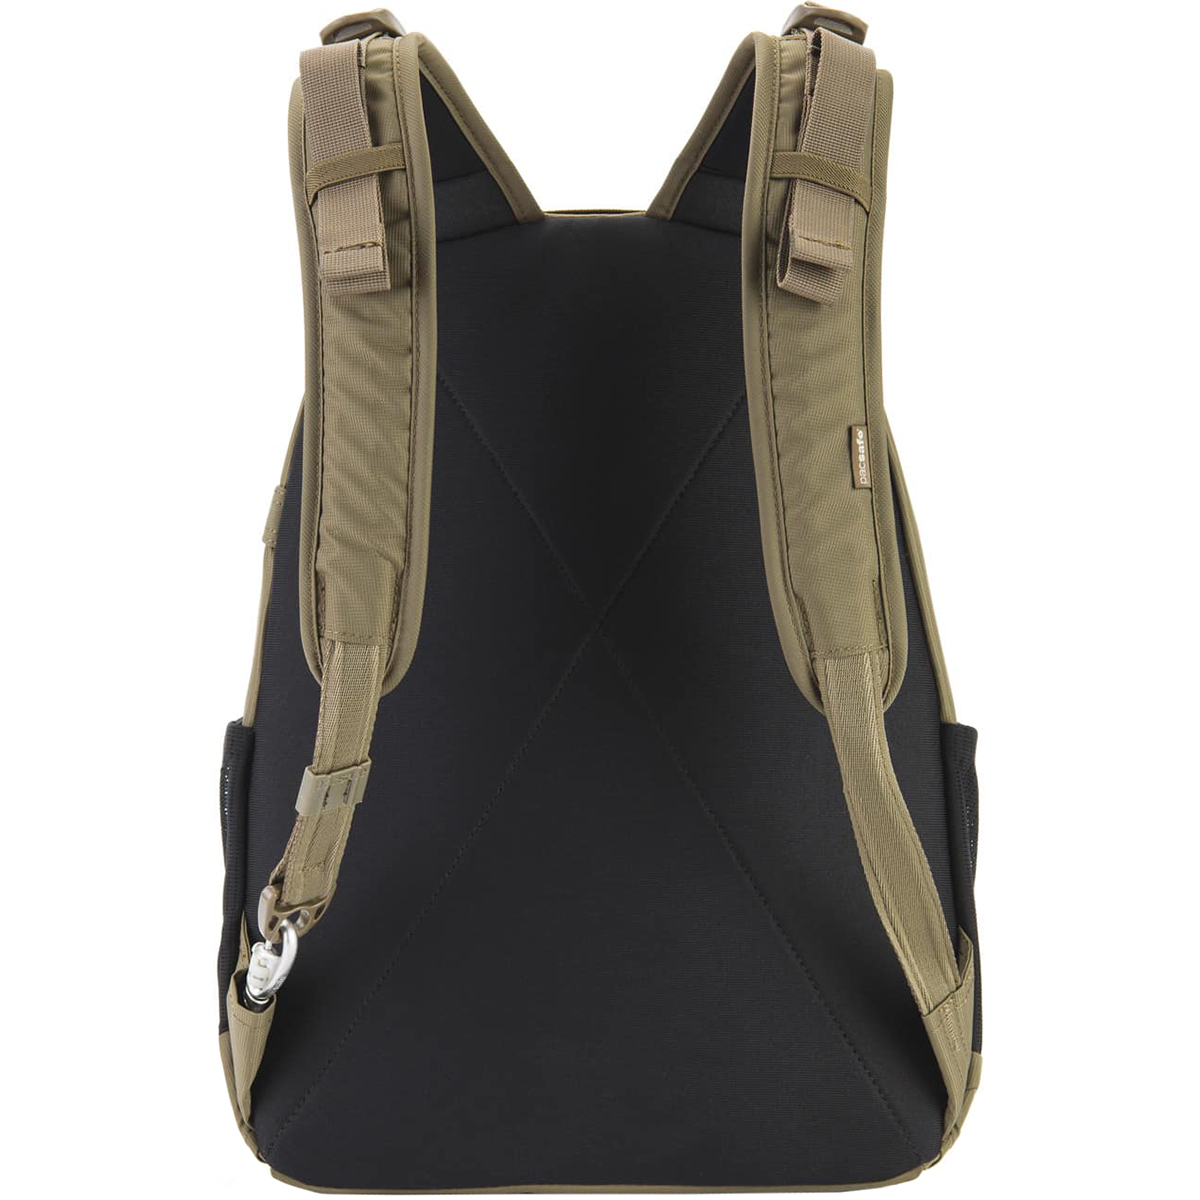 PacSafe-MetroSafe-LS350-Anti-Theft-15L-Backpack miniature 3